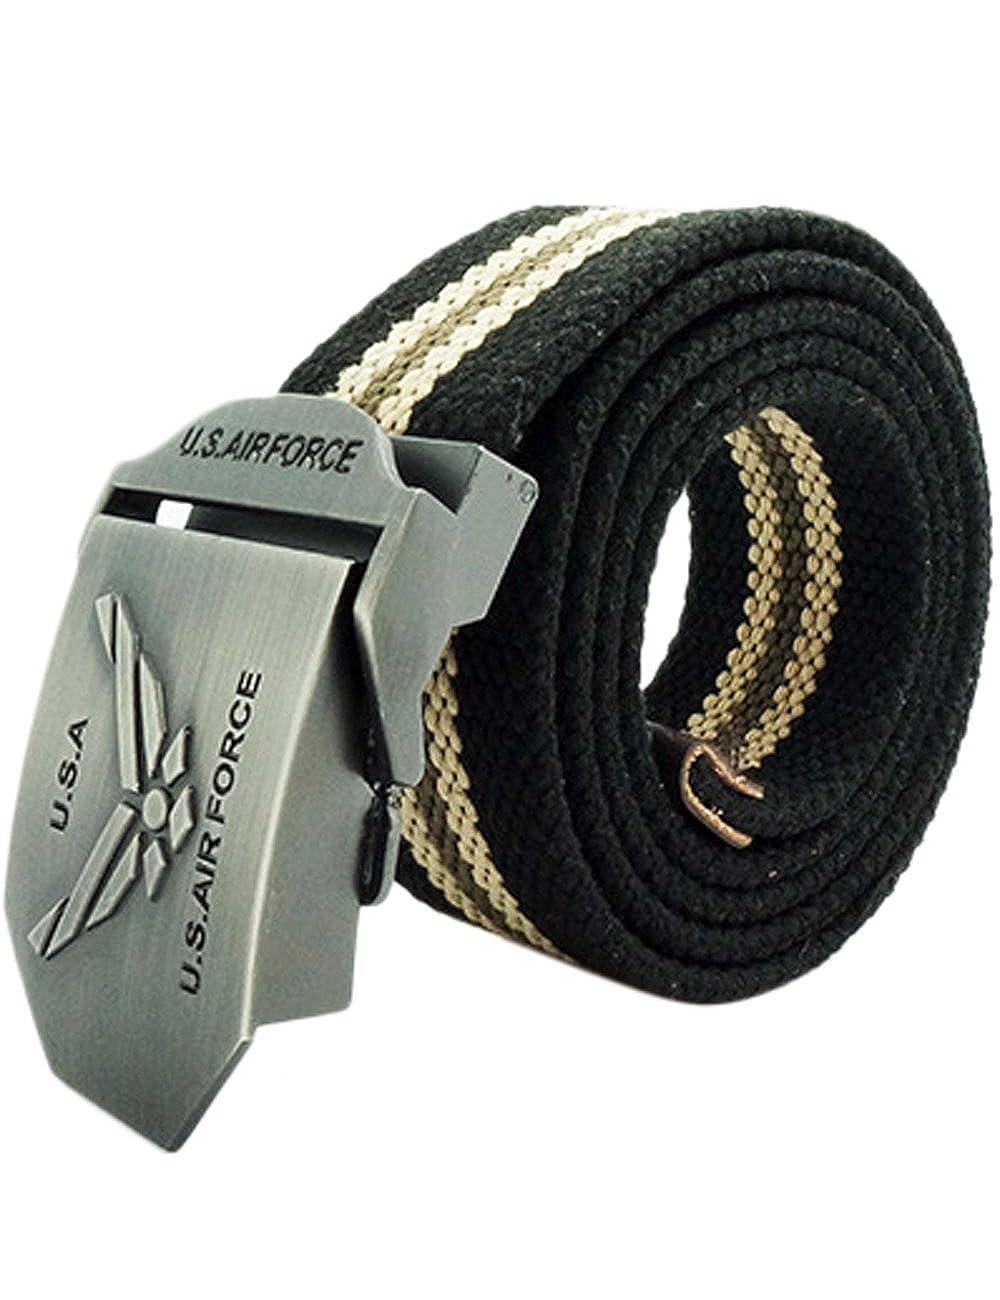 CUKKE Uomo Tela Belt Cintura Fibbia Automatica Pericolo Teschio Militare Metallica in acciaio inox Regolabile 120cm Adustable CN-FBPD-YWHX-203-WHT